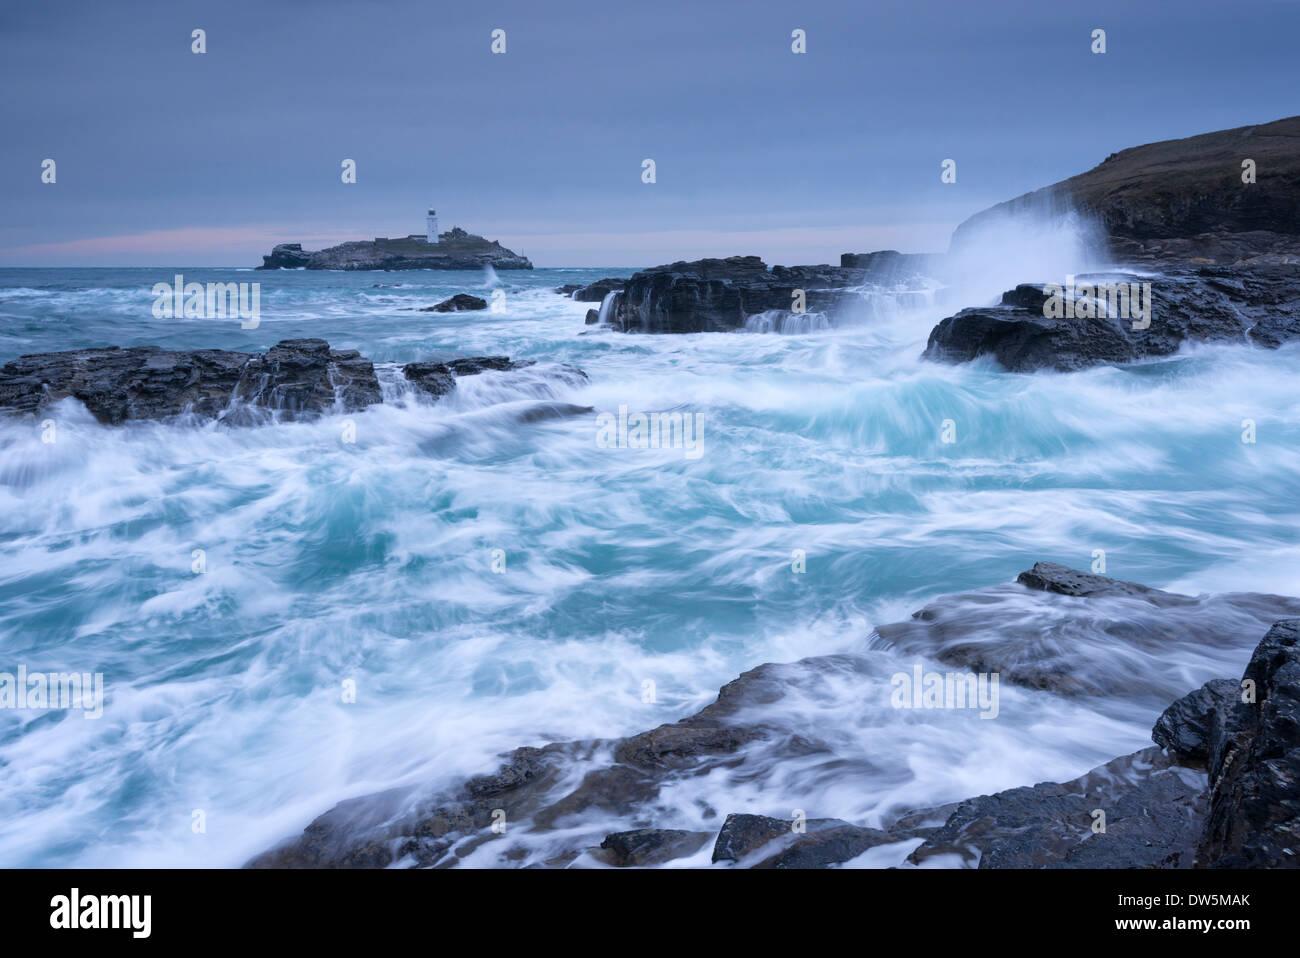 Si infrangono onde Atlantico vicino Godrevy Lighthouse, Cornwall, Inghilterra. Inverno (febbraio) 2013. Immagini Stock